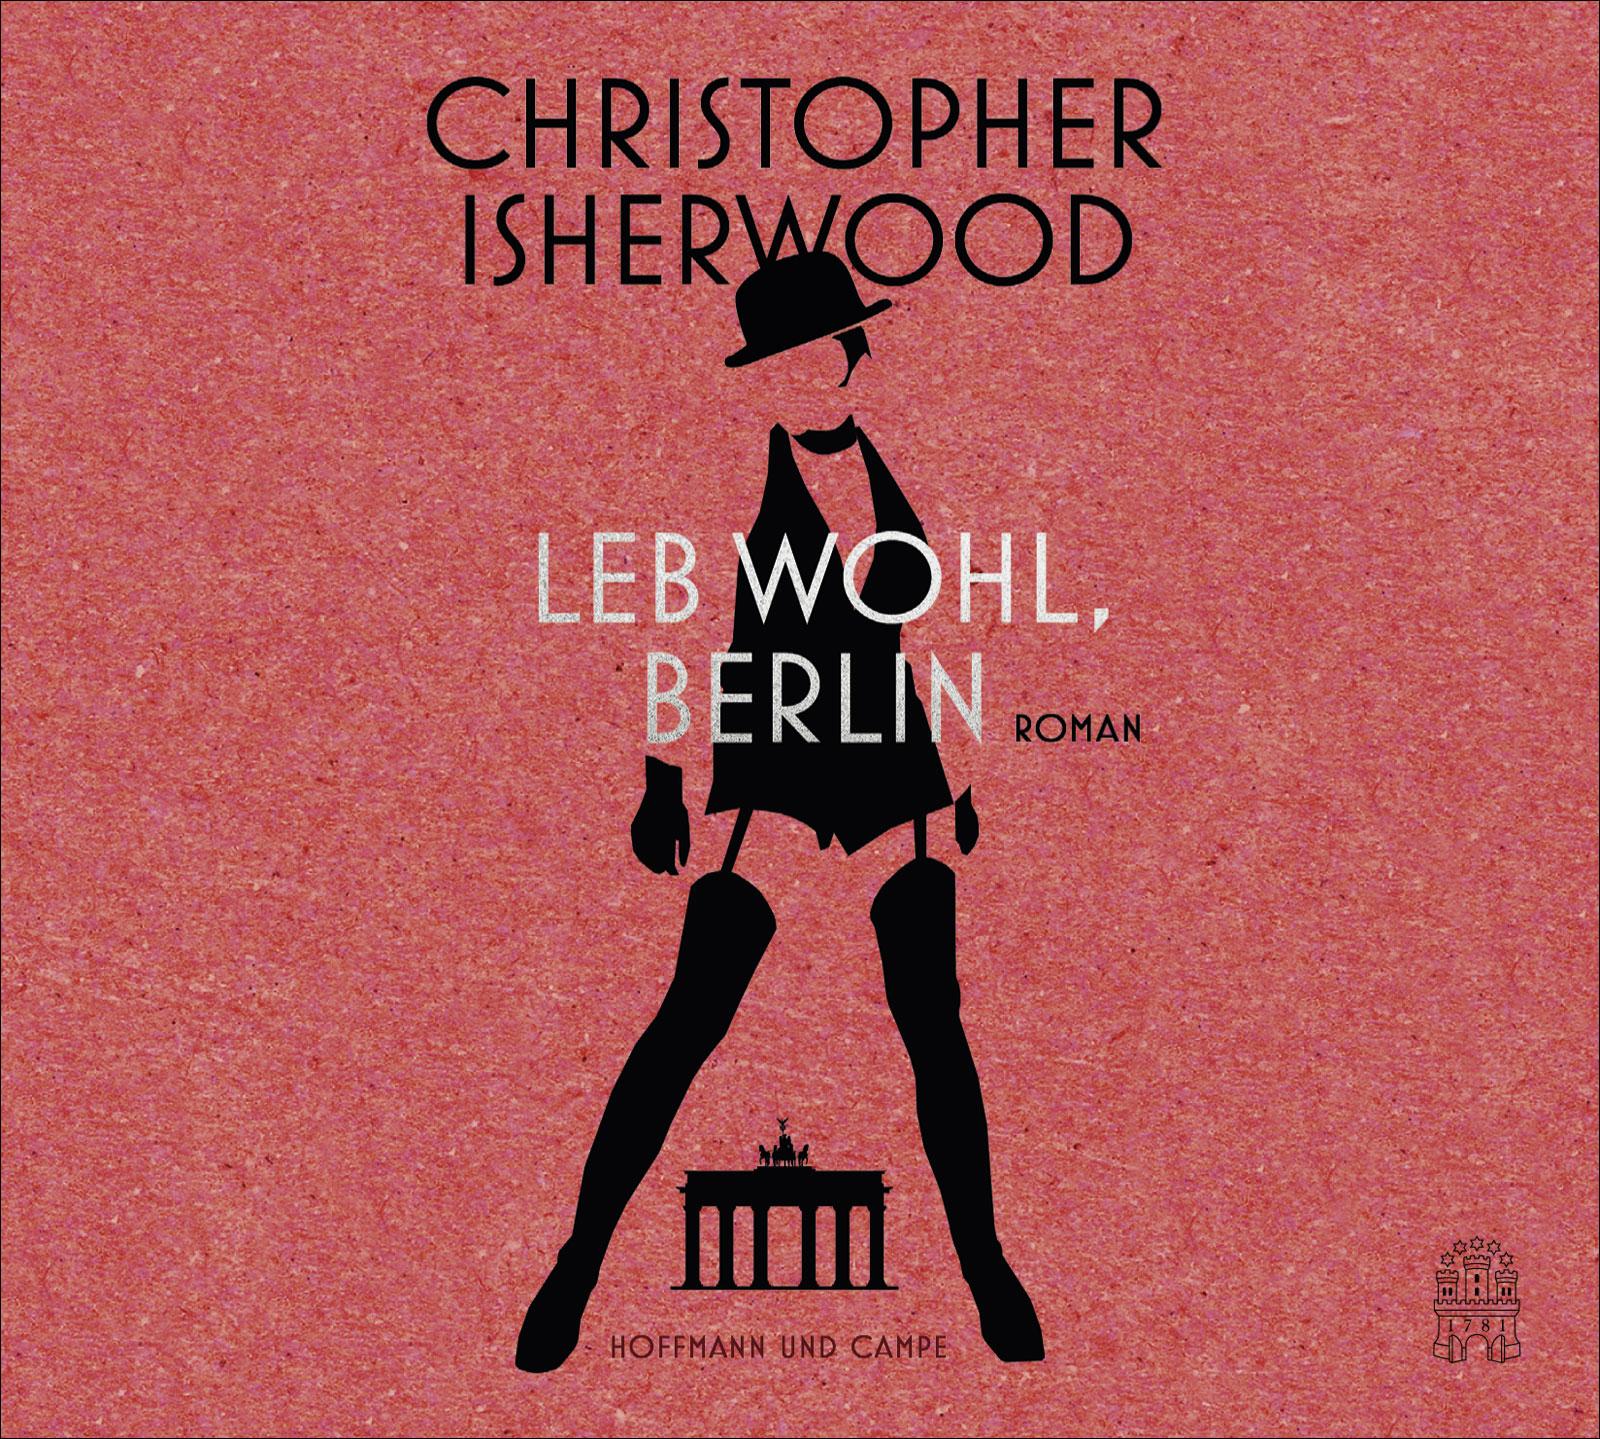 Leb wohl, Berlin - Isherwood, Christopher